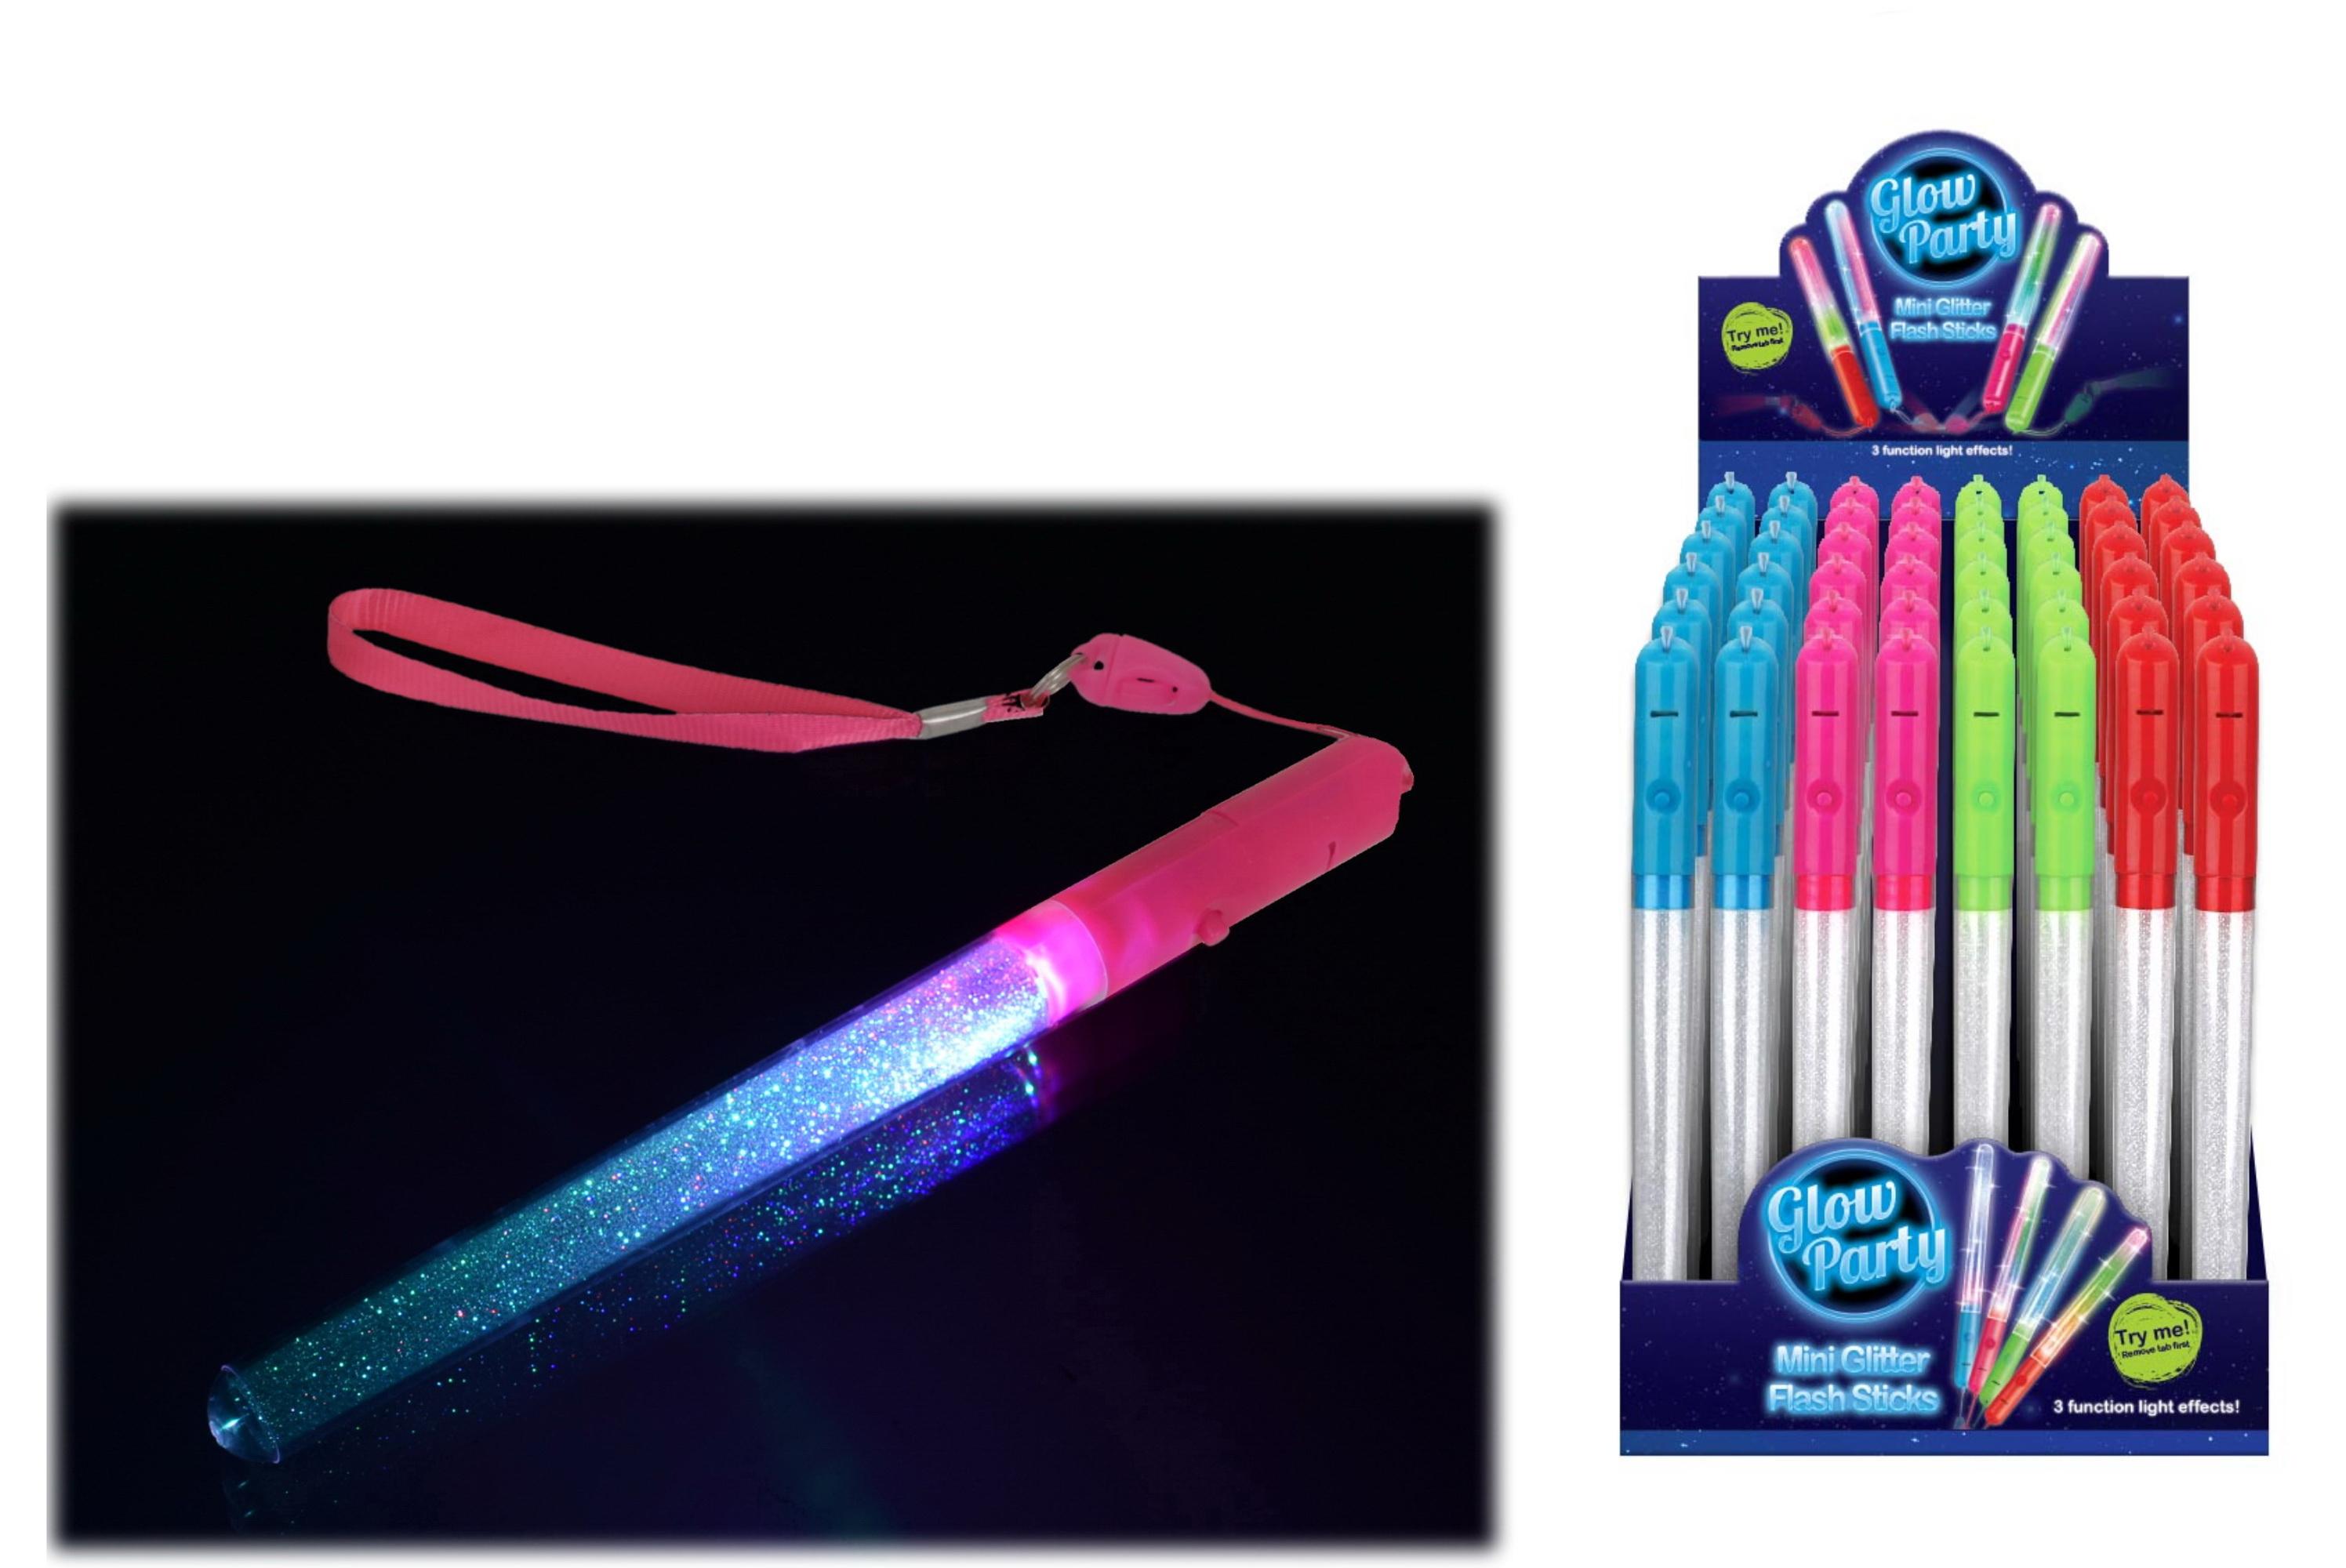 Mini Glitter Flash Sticks (4 Colours) In Display Box